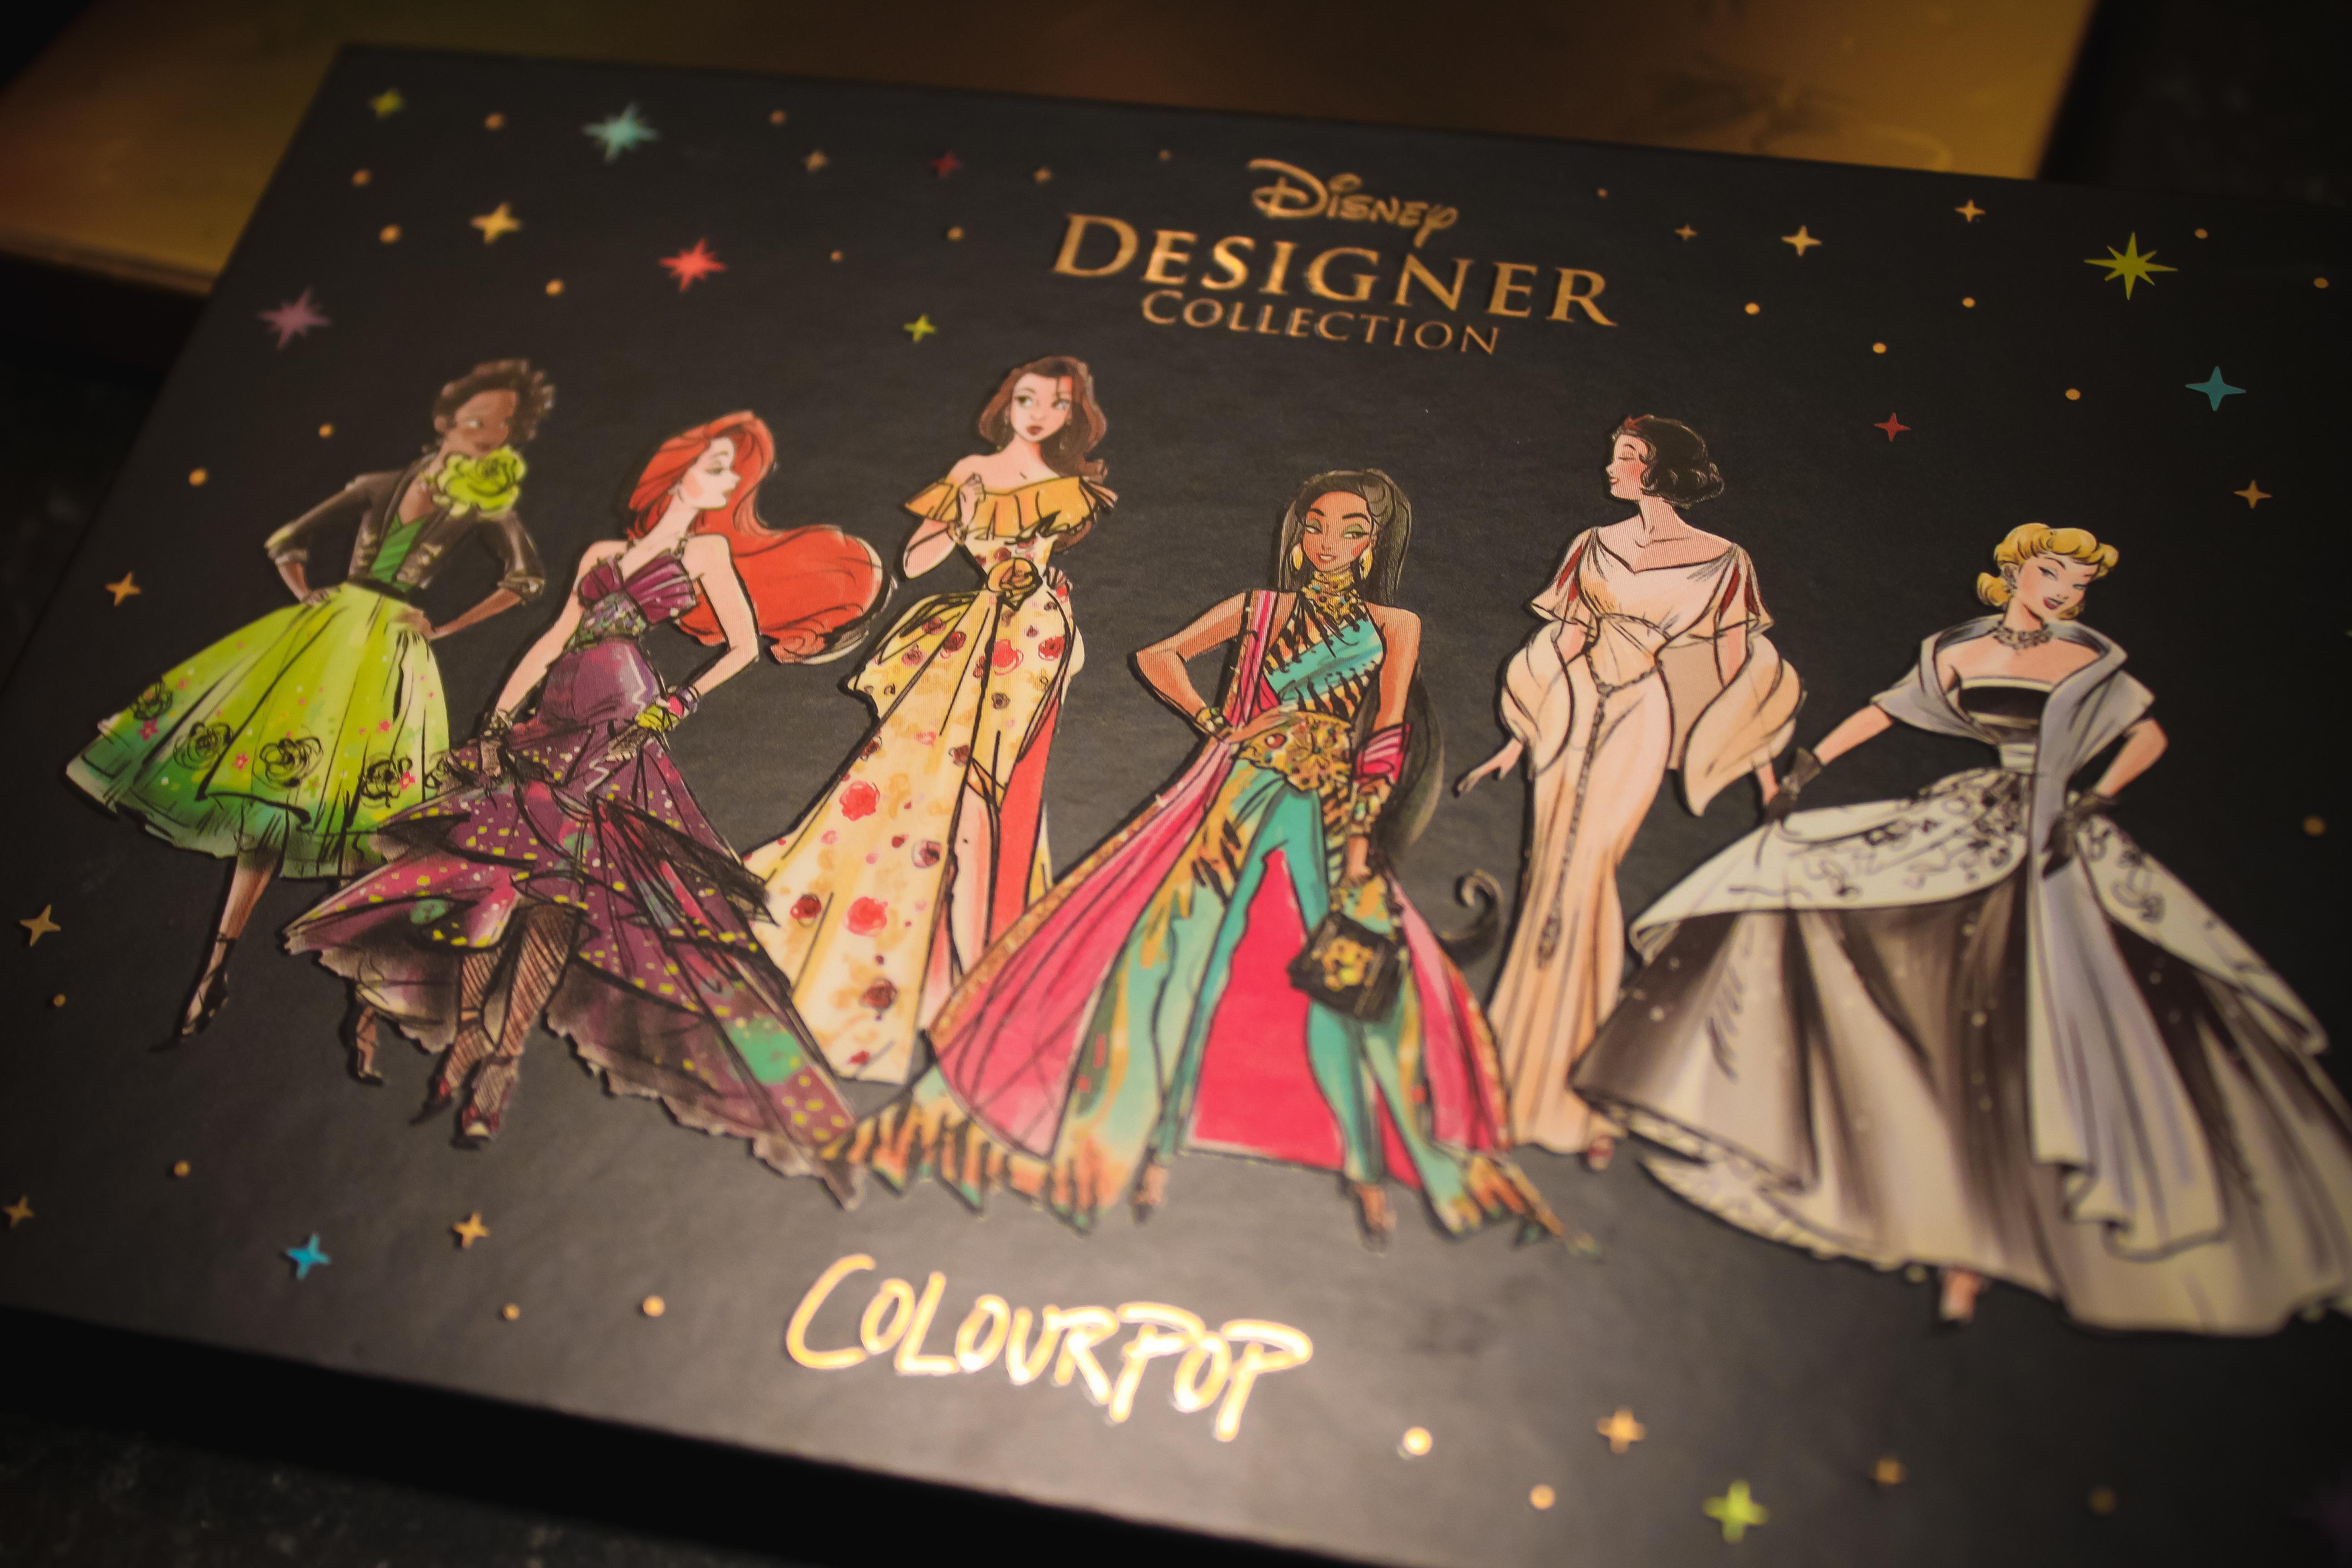 Colourpop x Disney Designer Collection Palette 5